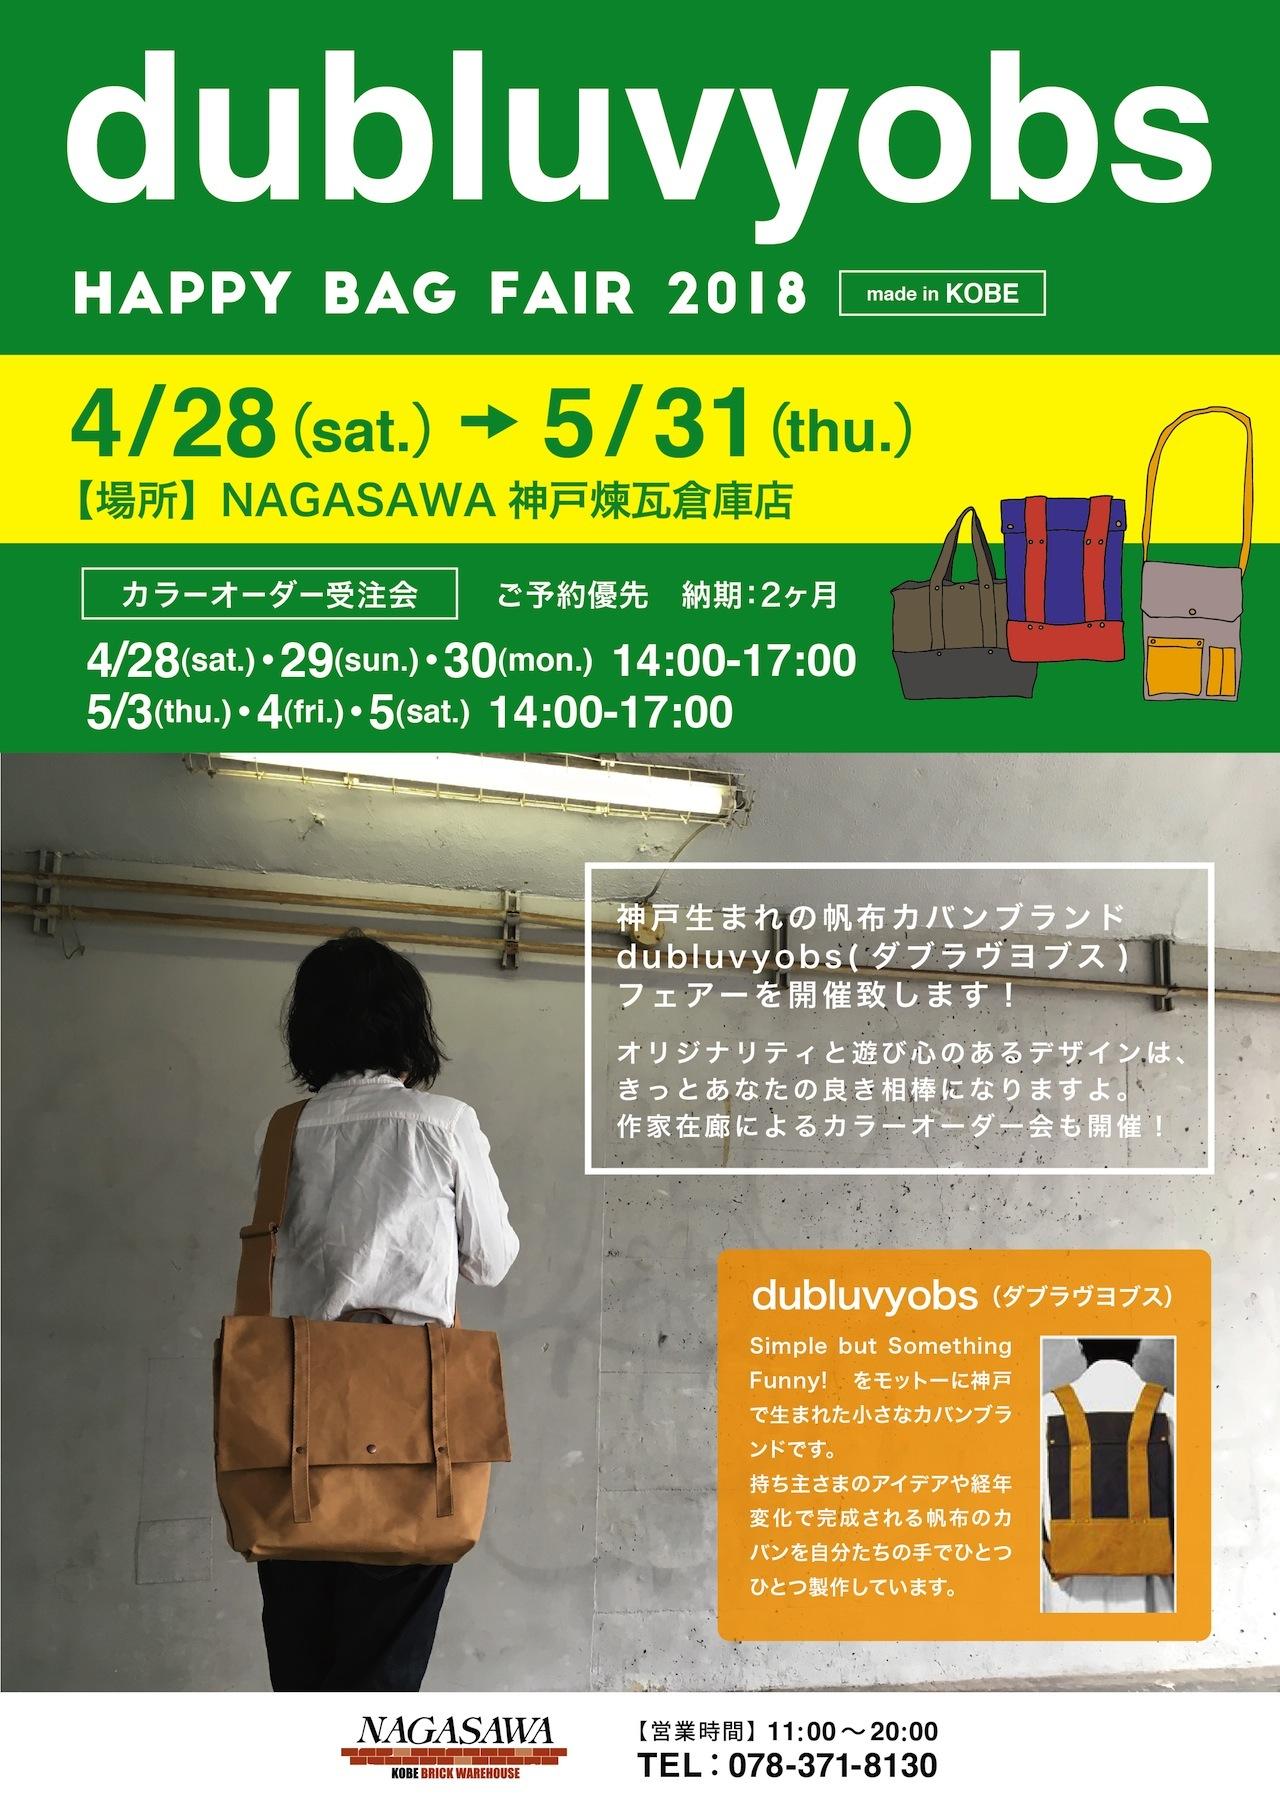 dubluvyobs(ダブラヴヨブス)バッグコレクション2018   NAGASAWA神戸煉瓦倉庫店